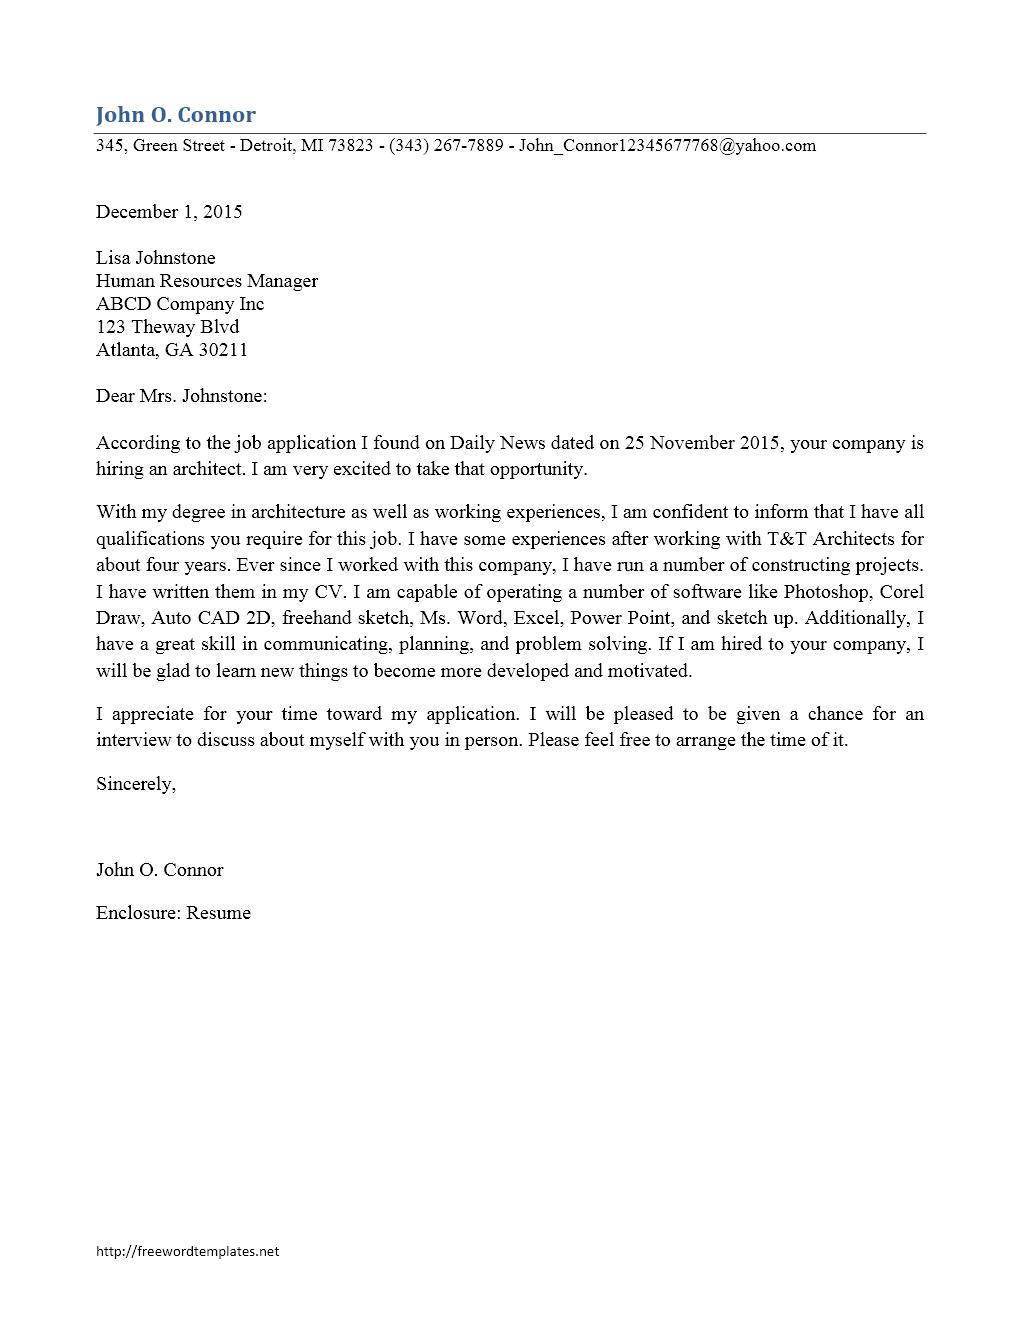 Job Application Letter For Computer Operator